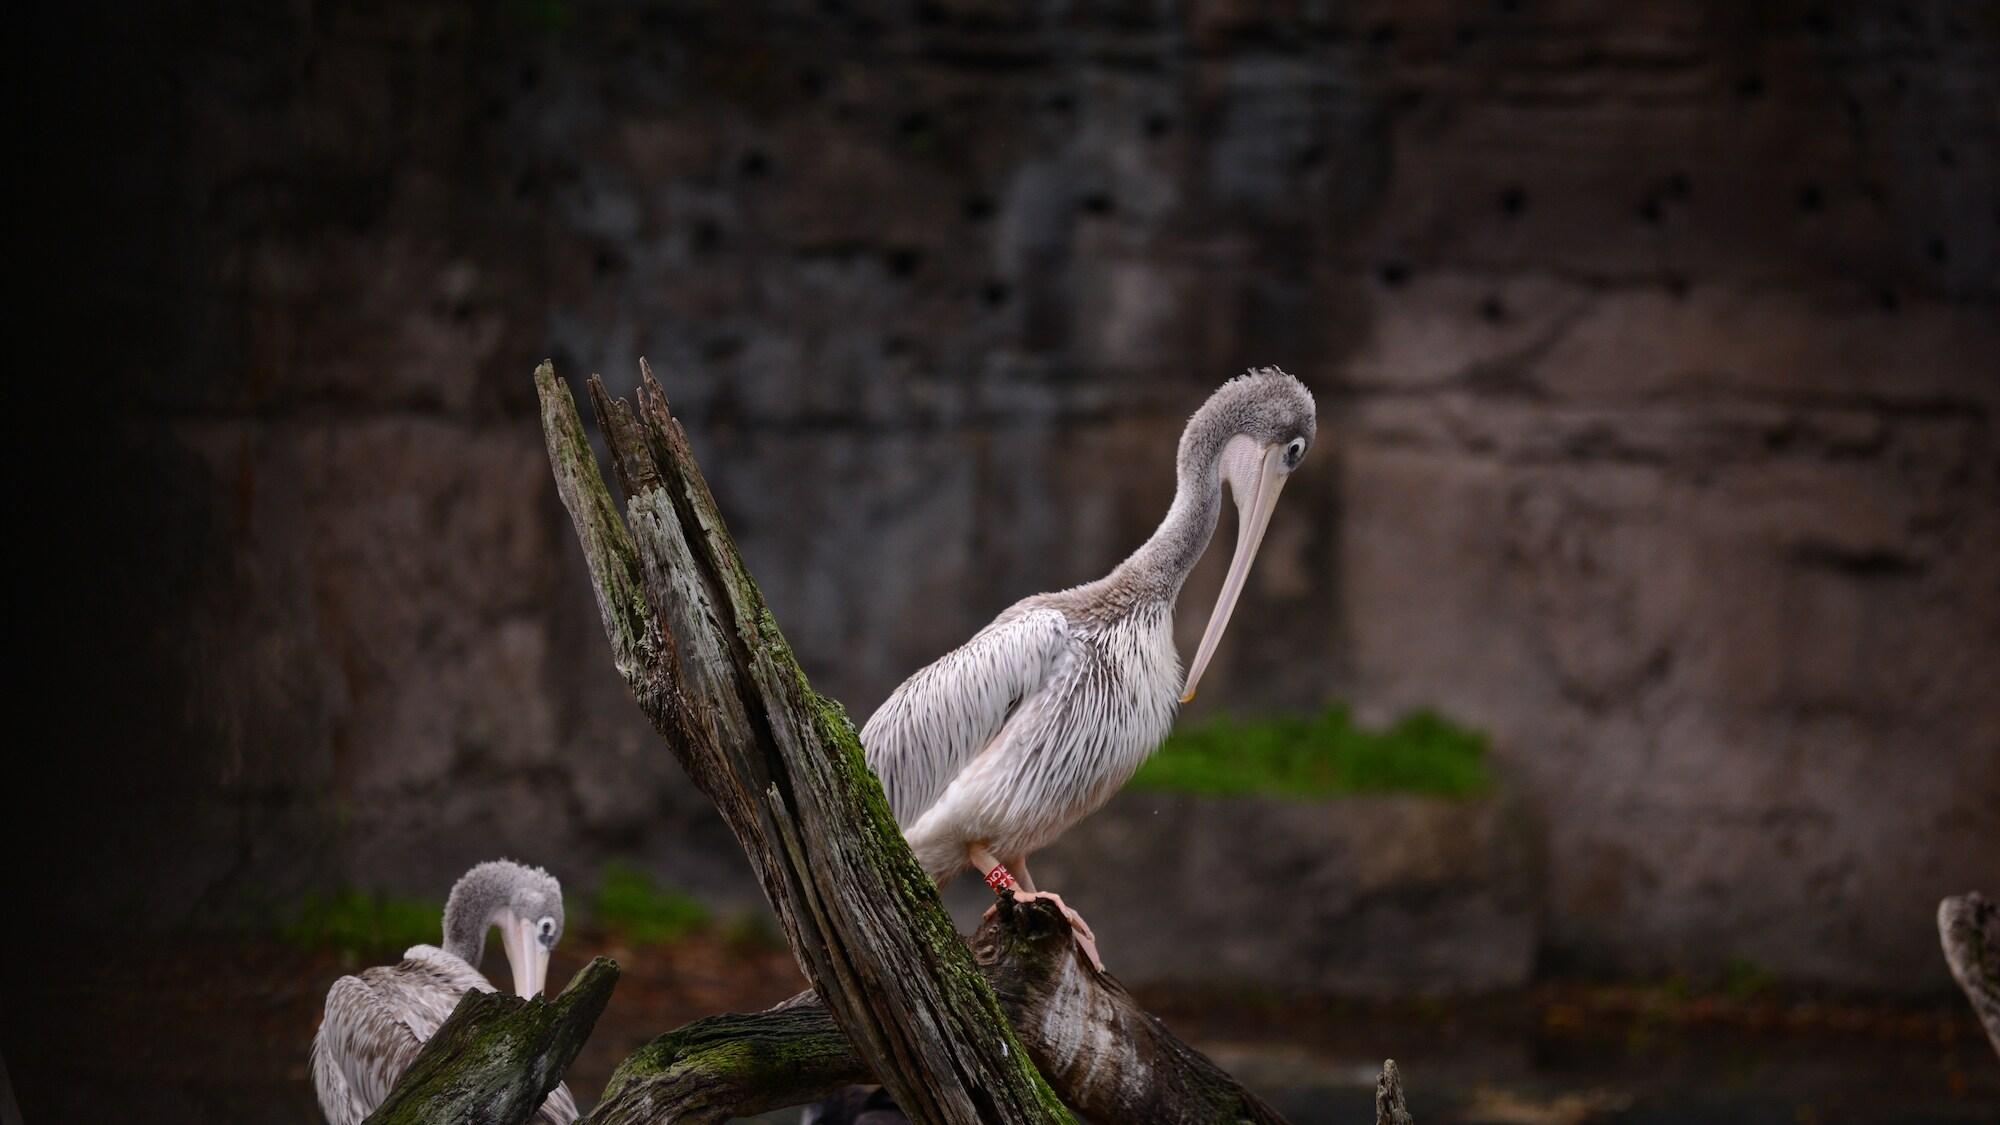 Pink Backed Pelican at Kilimanjaro Safari. (National Geographic/Gene Page)